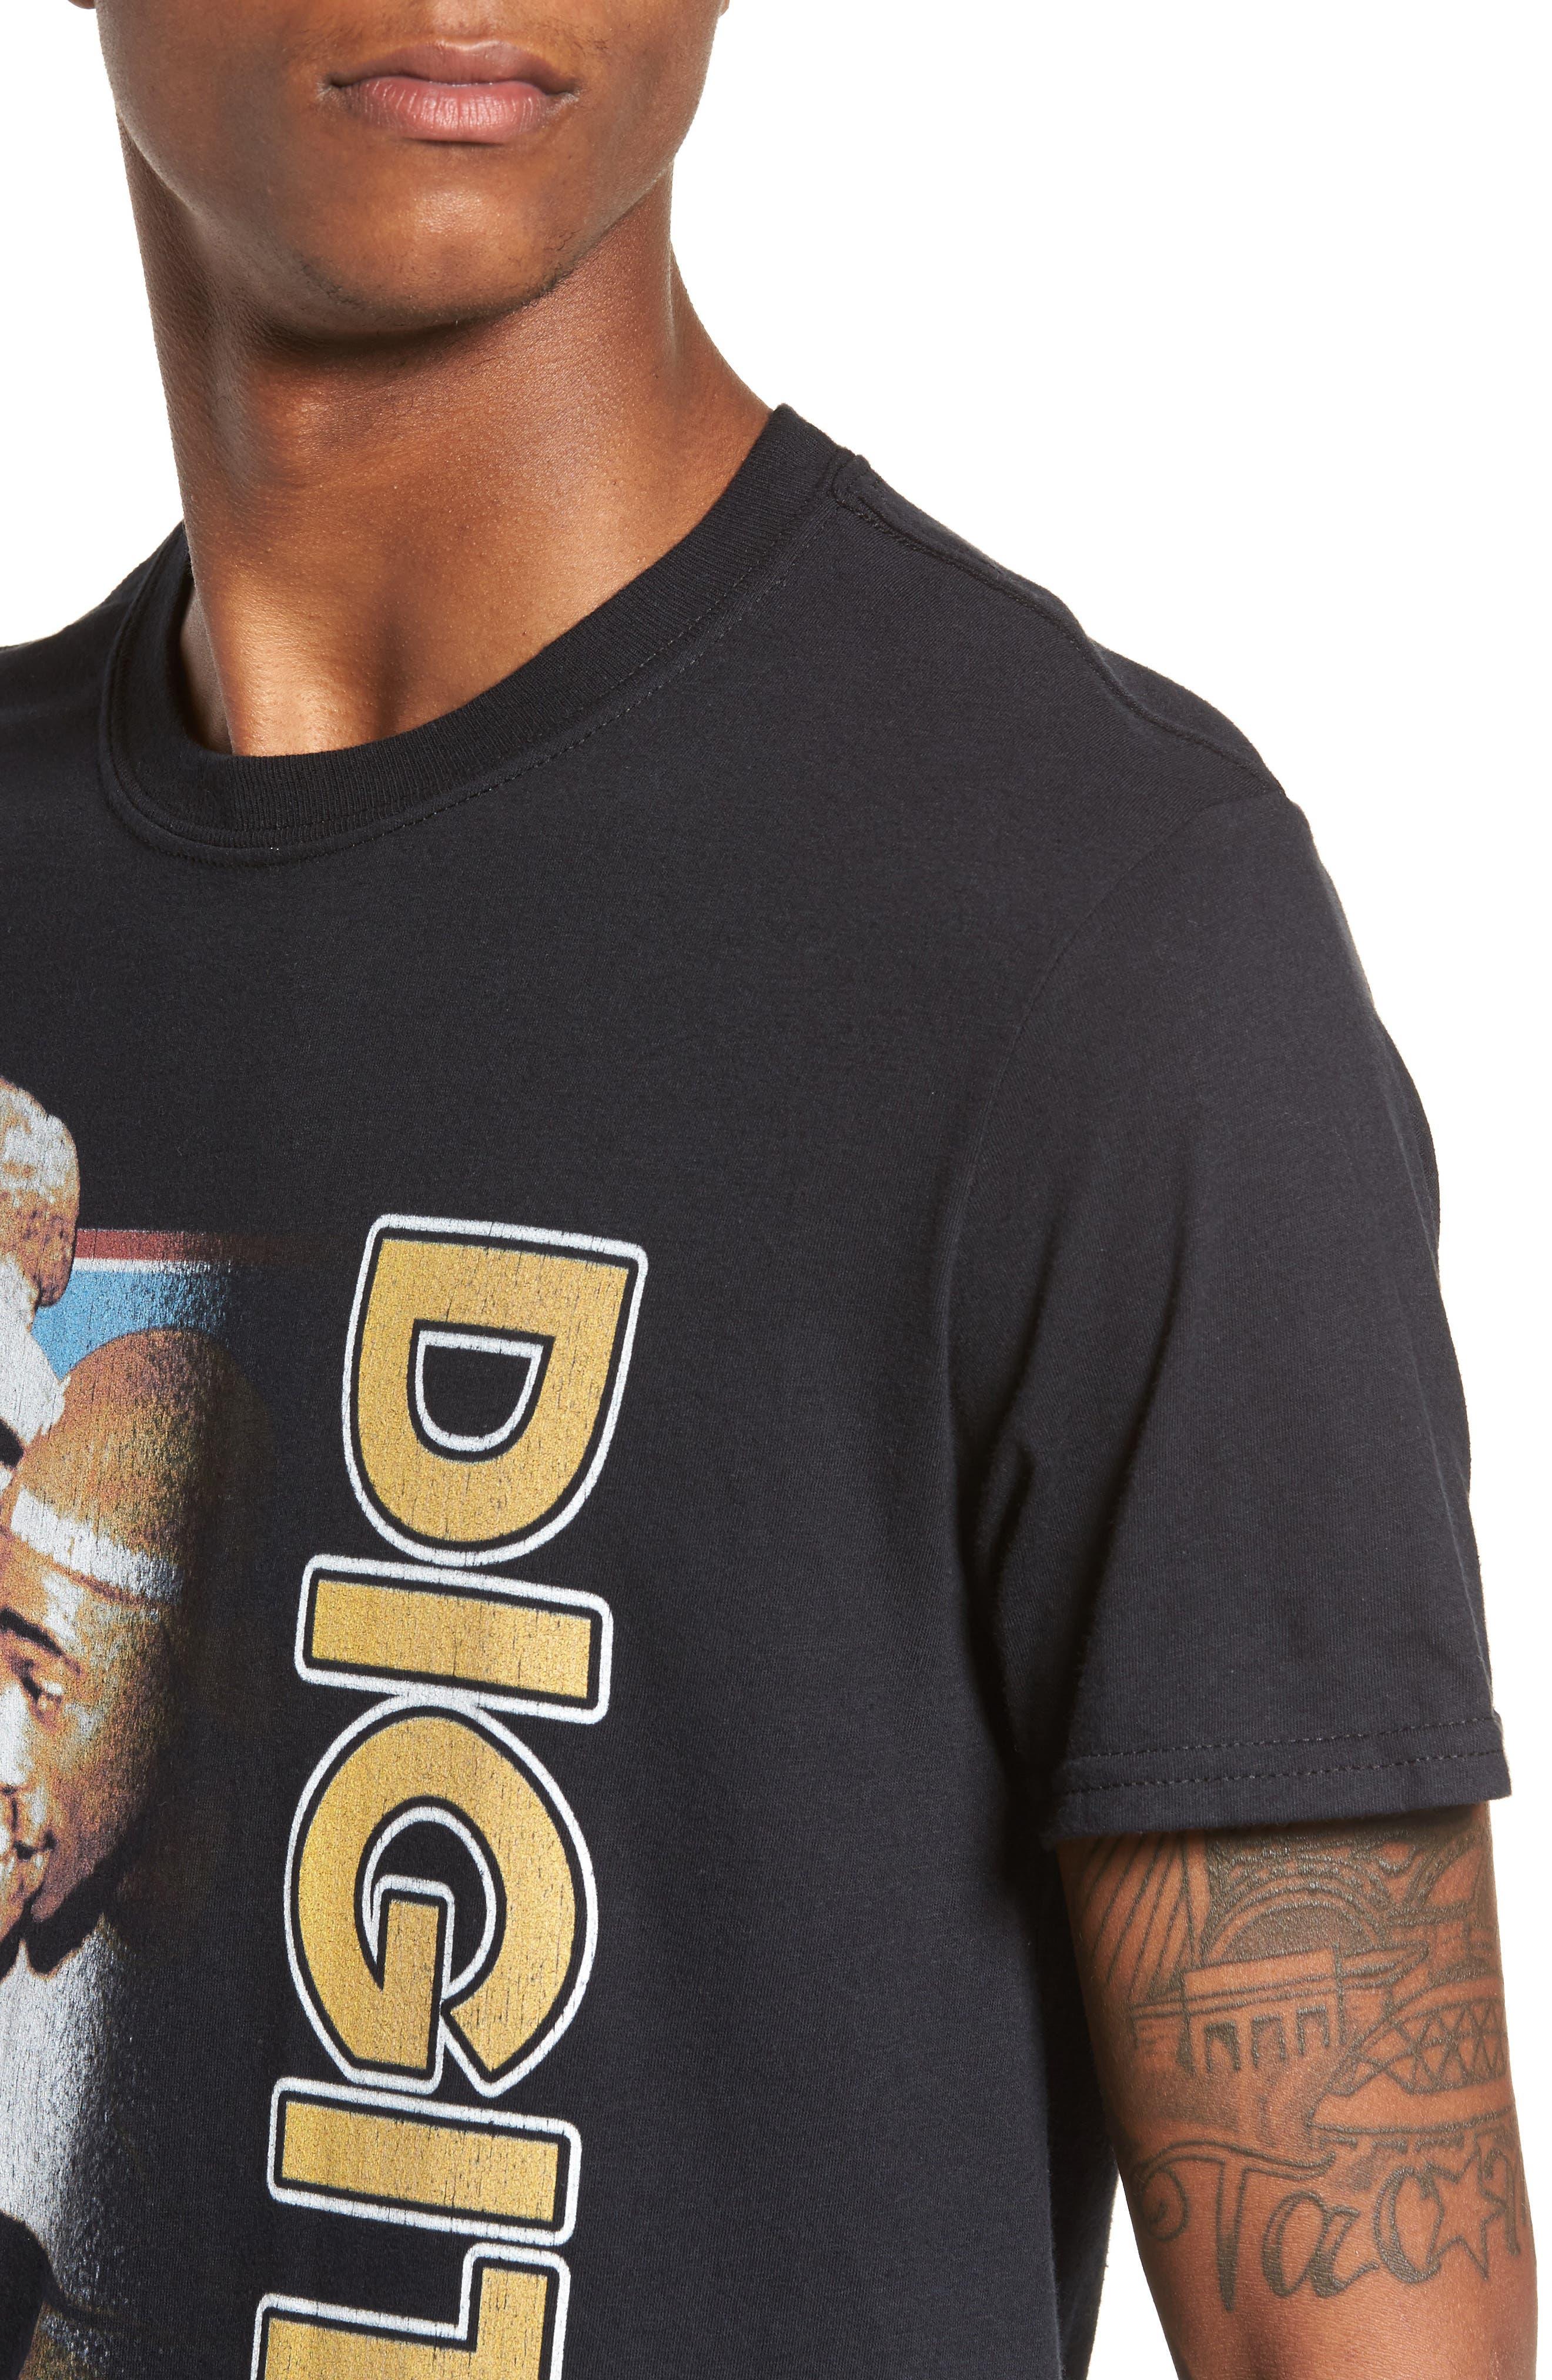 Digital Underground T-Shirt,                             Alternate thumbnail 4, color,                             001